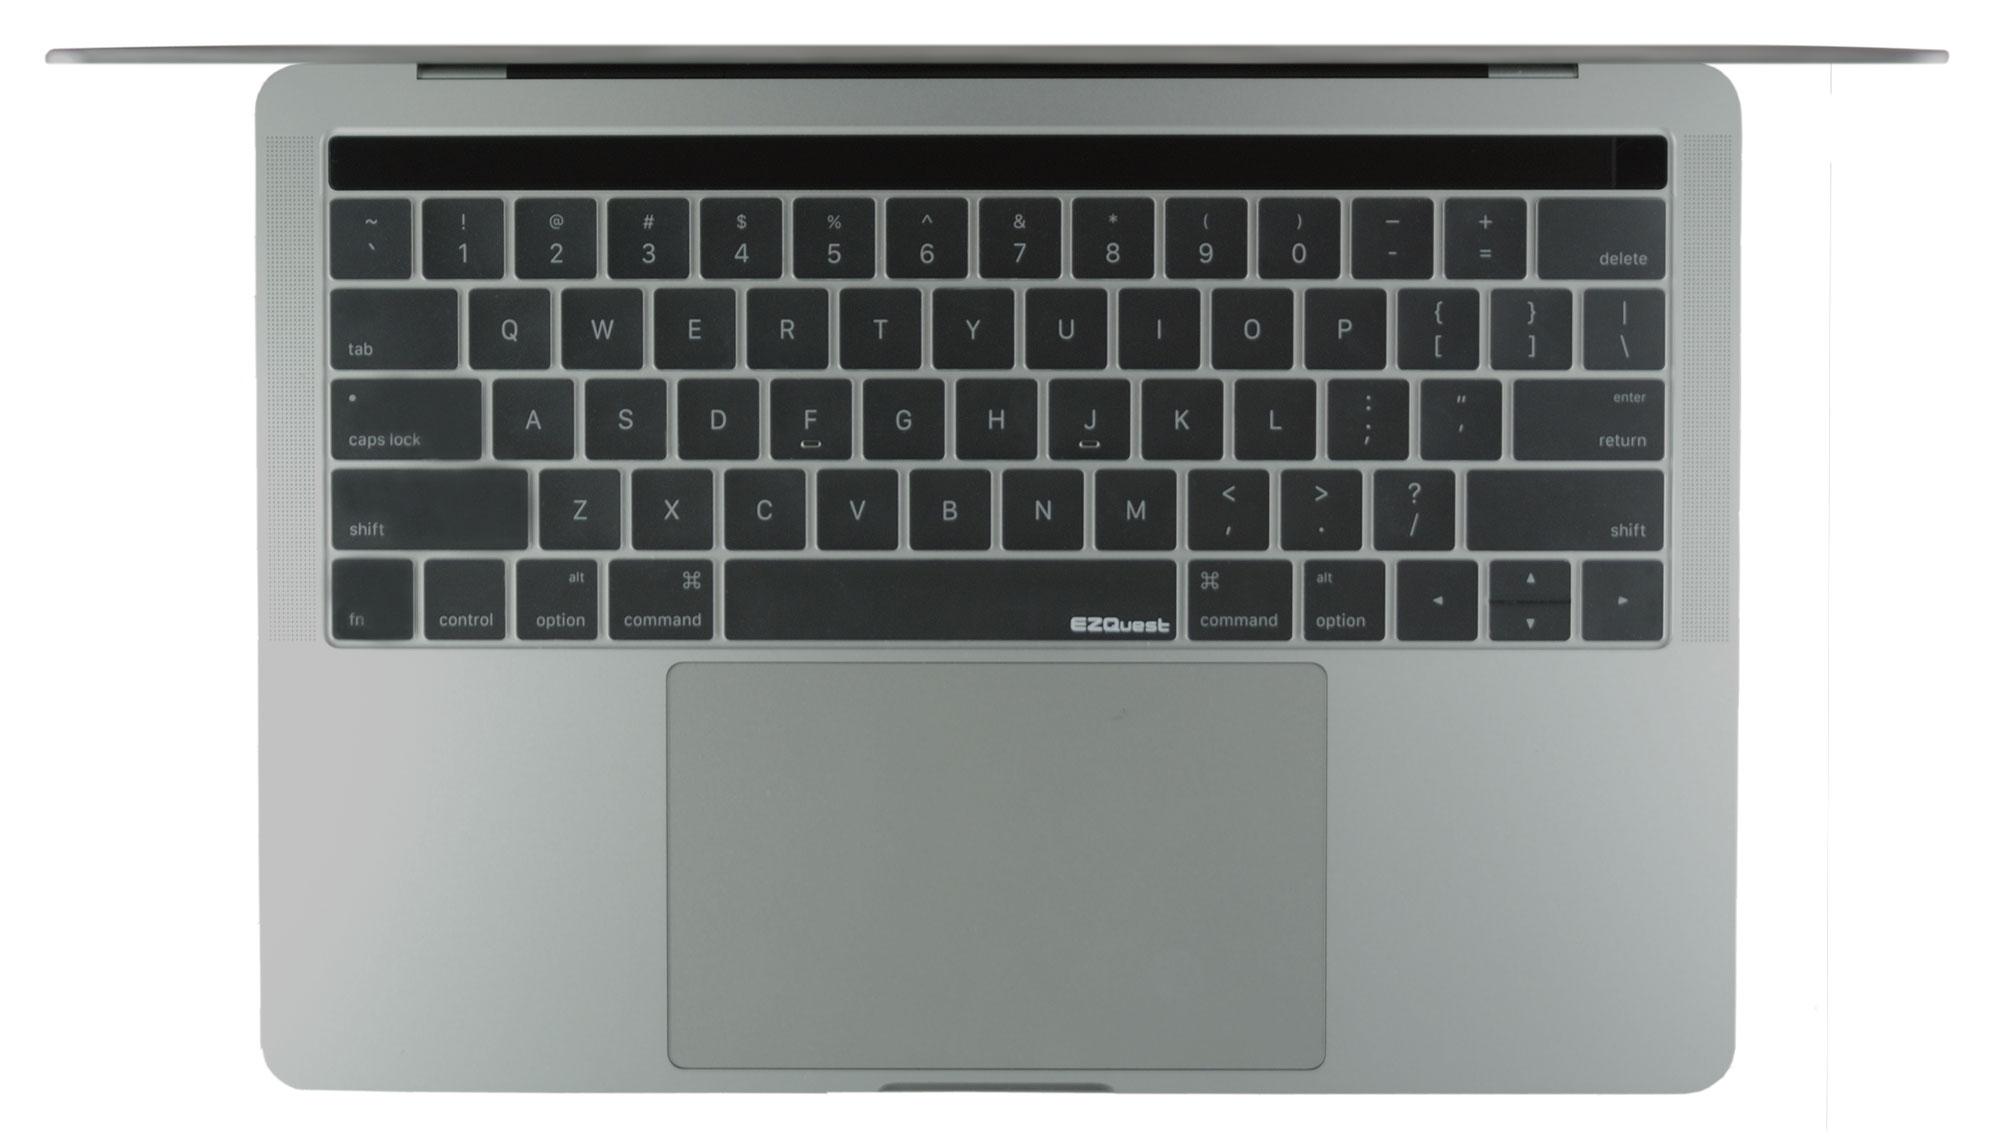 Mac computer keyboard cover